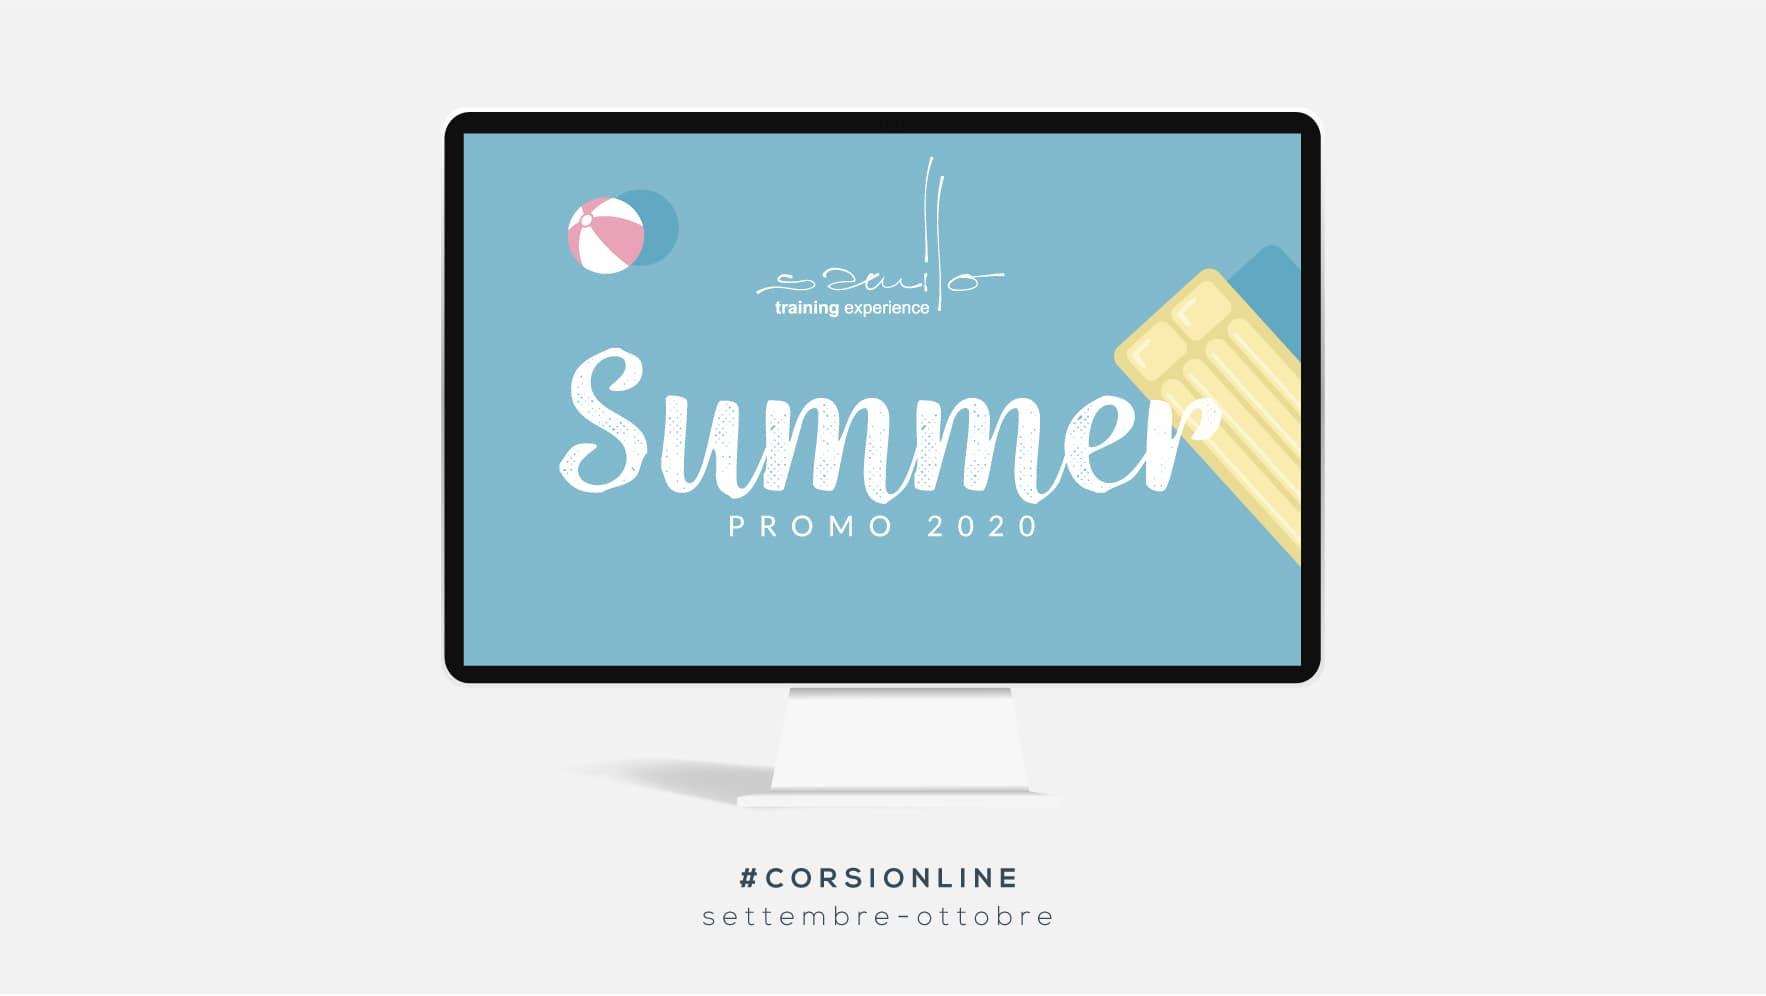 summer-promo-2020_pagina-min